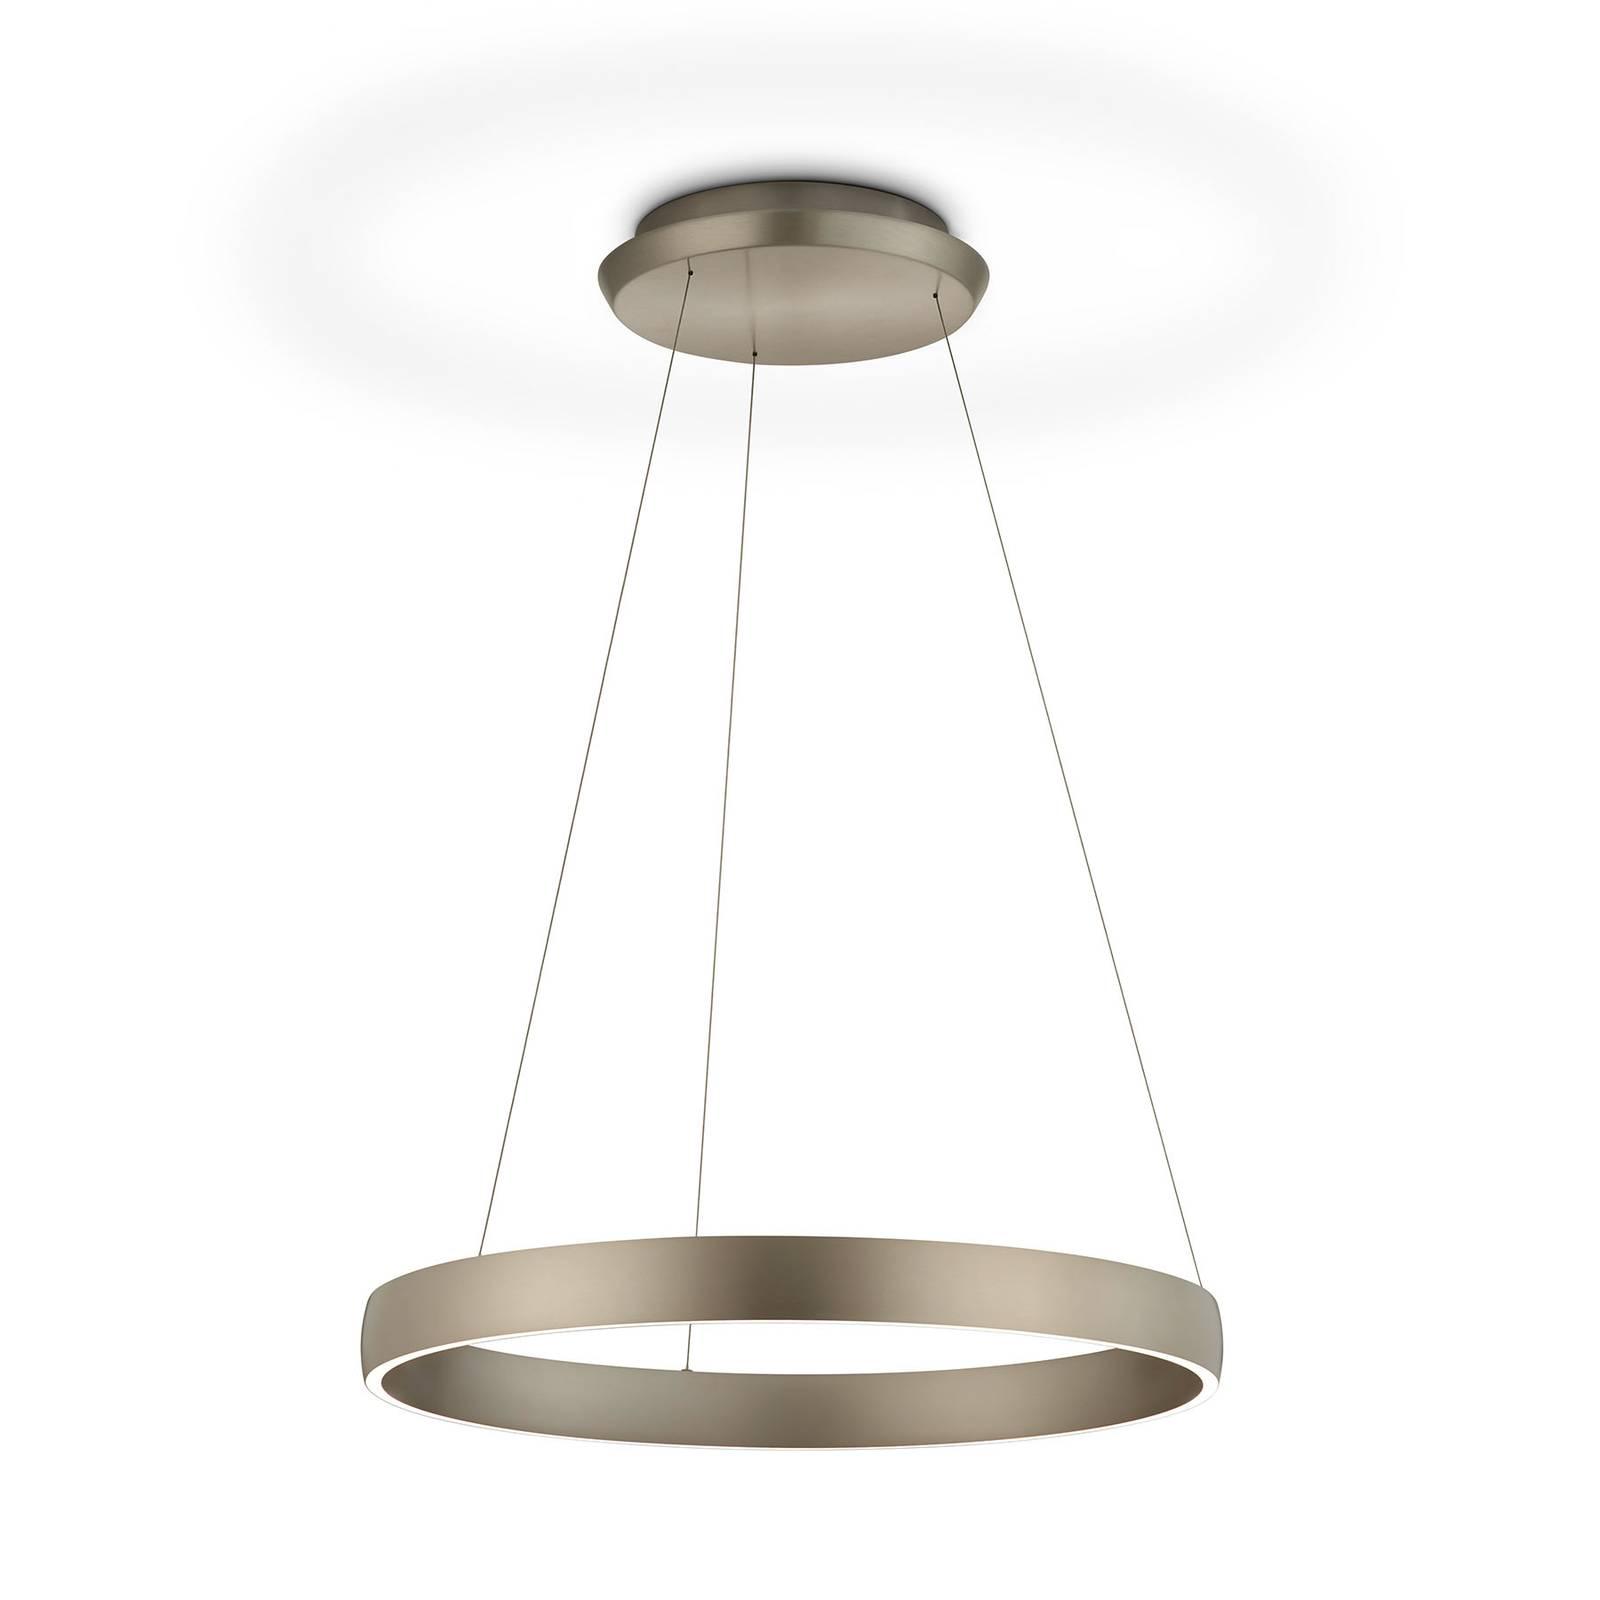 LED-riippuvalaisin Sara-60 bronze 2 200 - 3 000 K